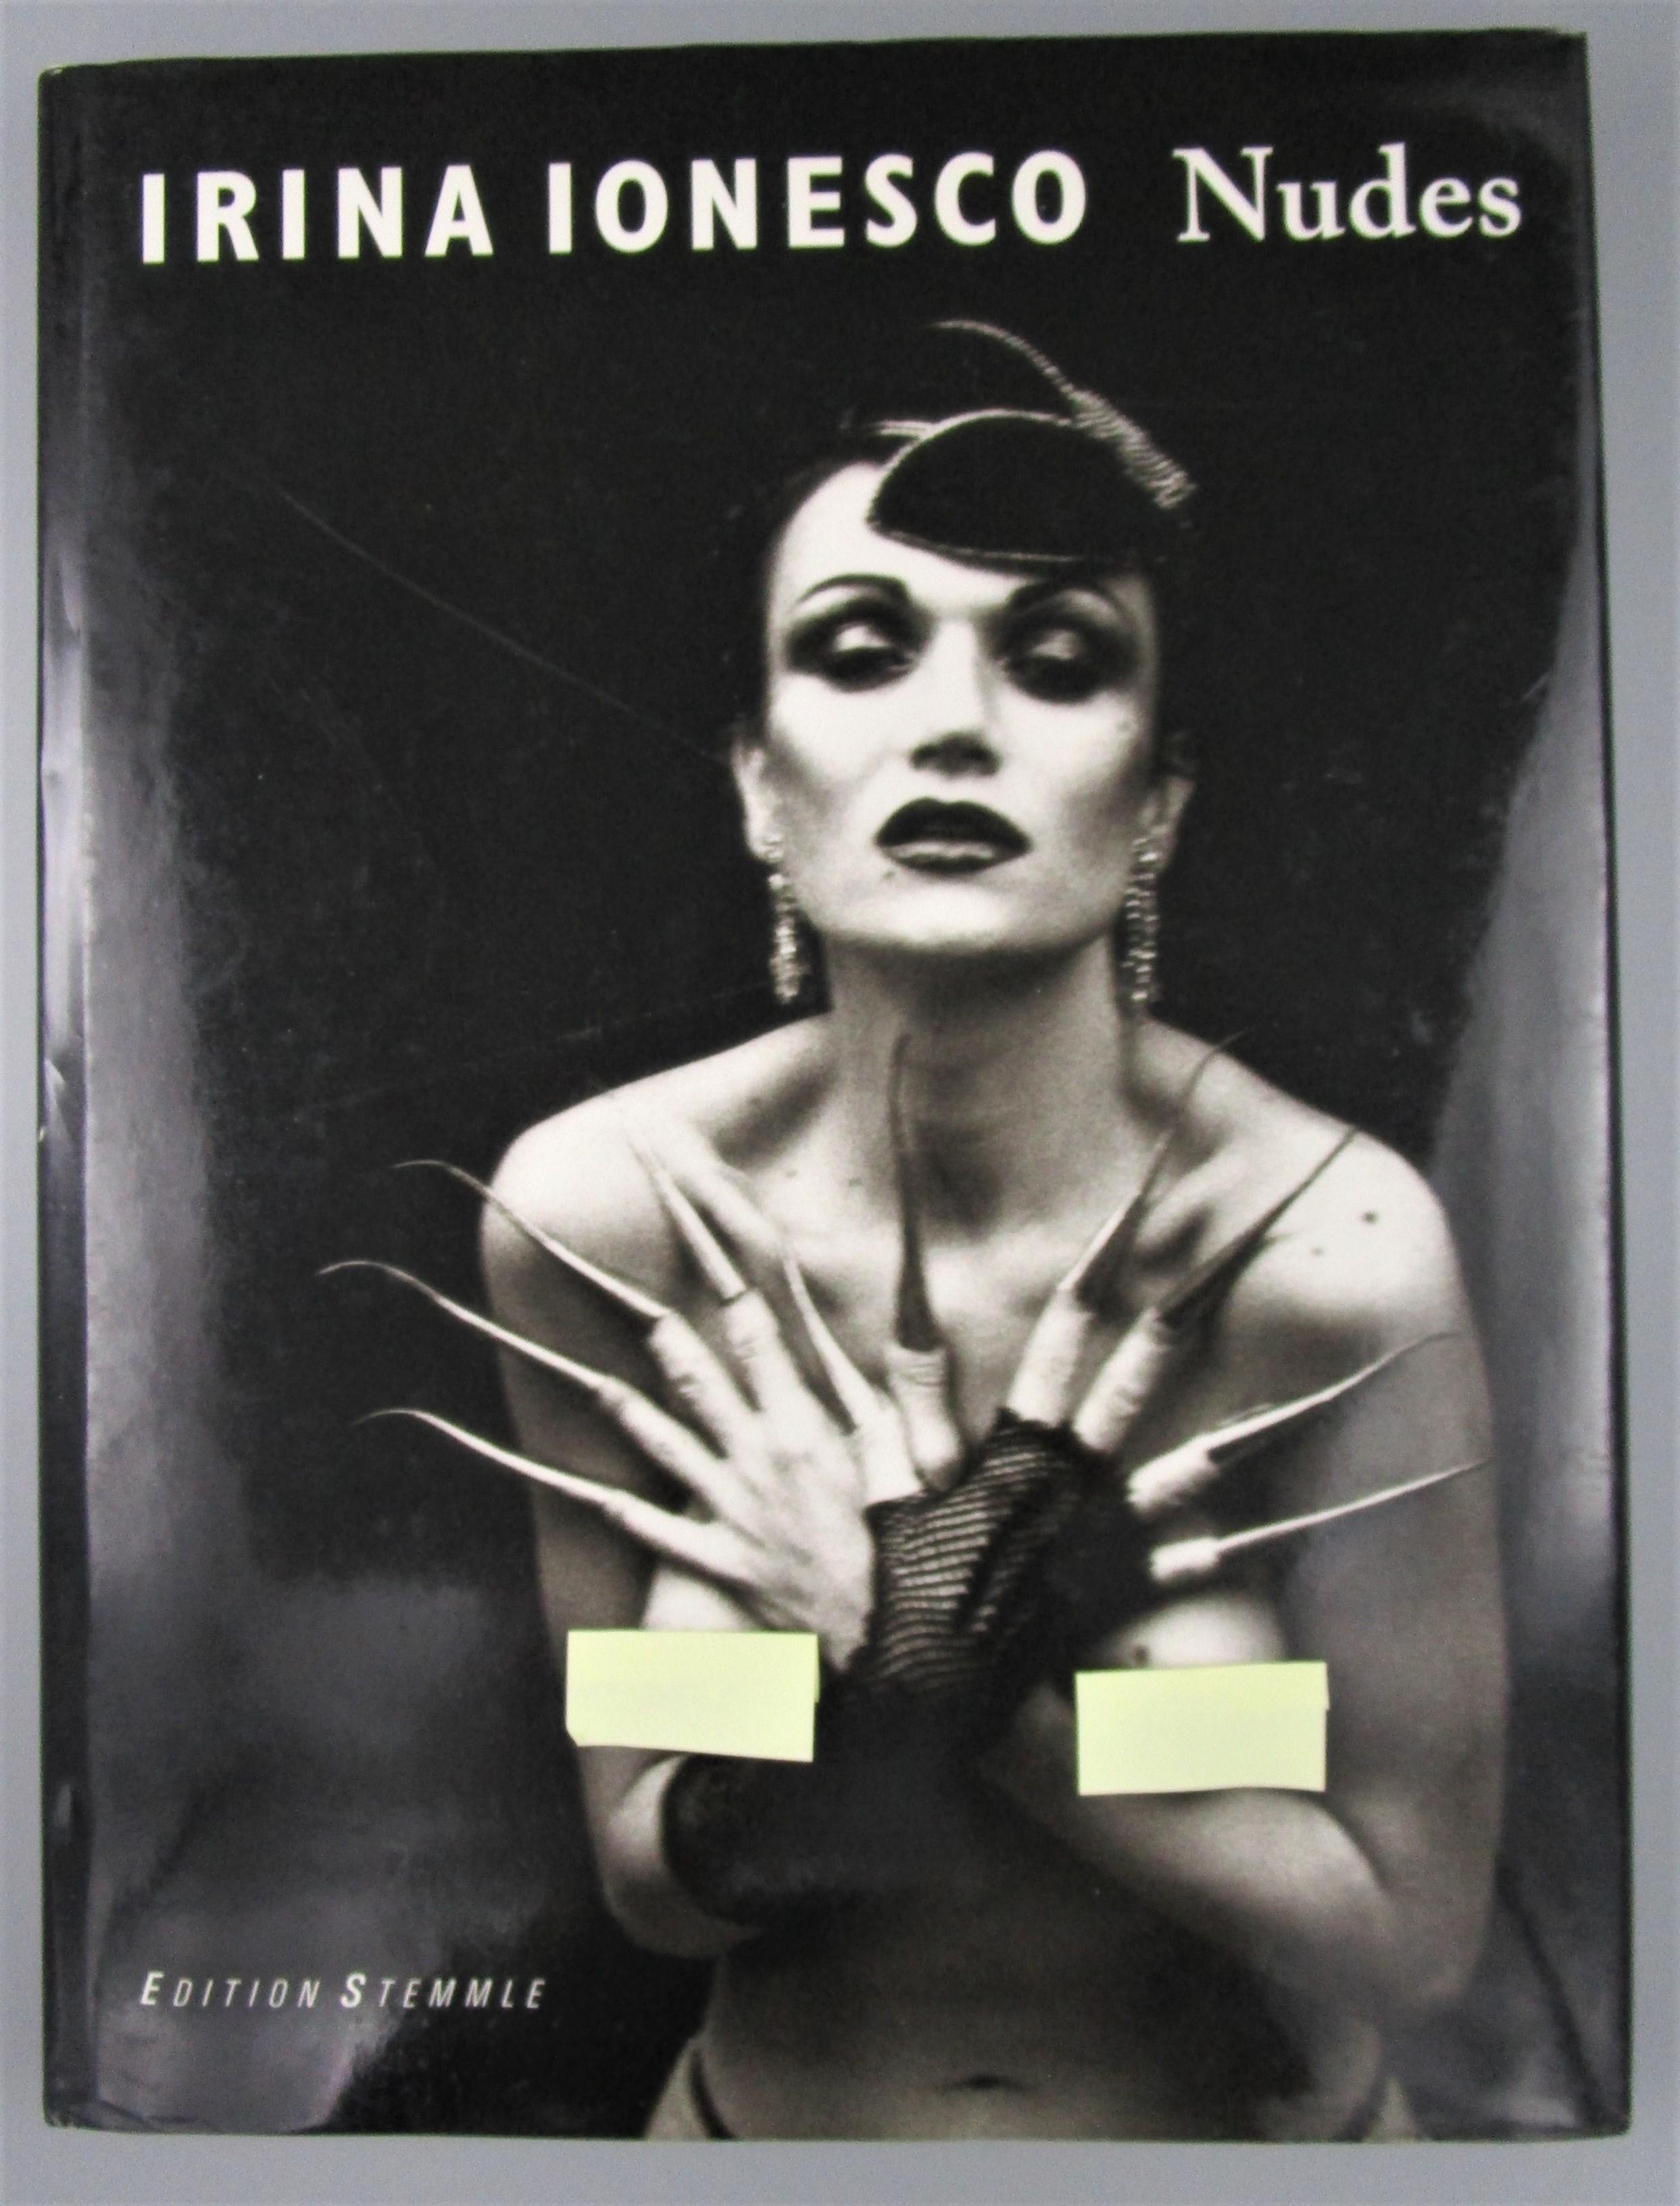 NUDES, by Irina Ionesco - 1996